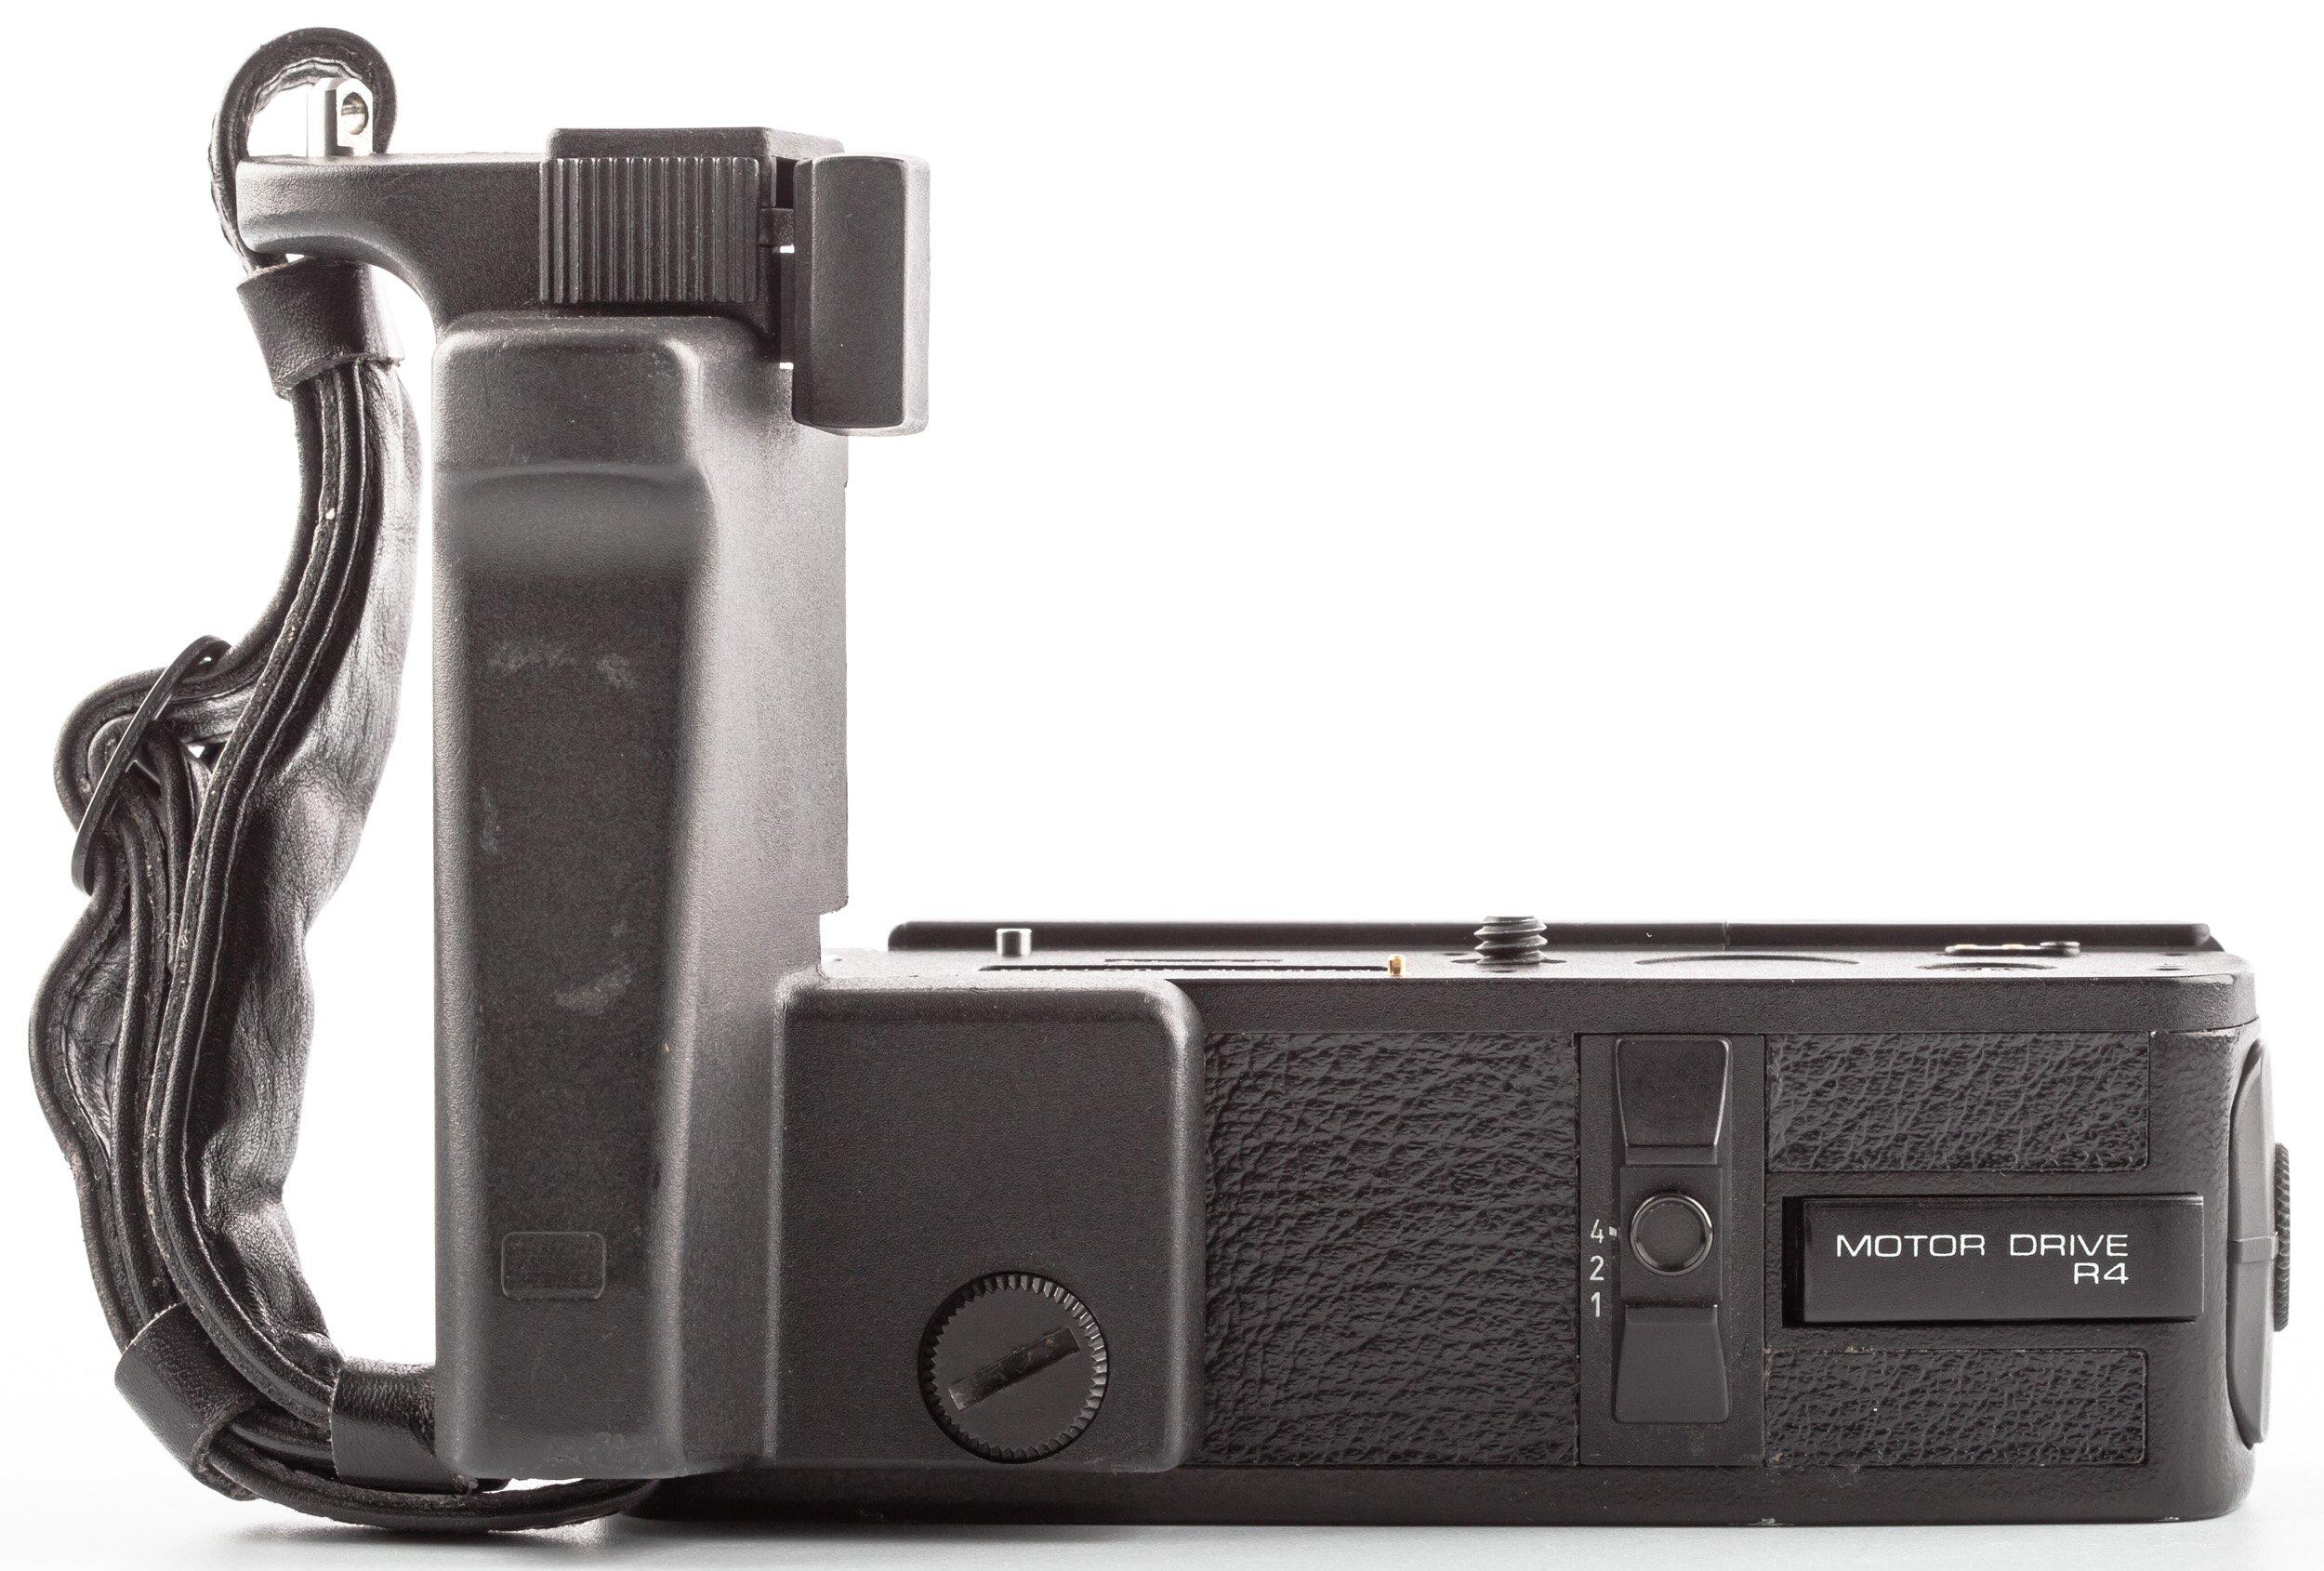 Leica Motordrive R4 14292 mit Griff 14283